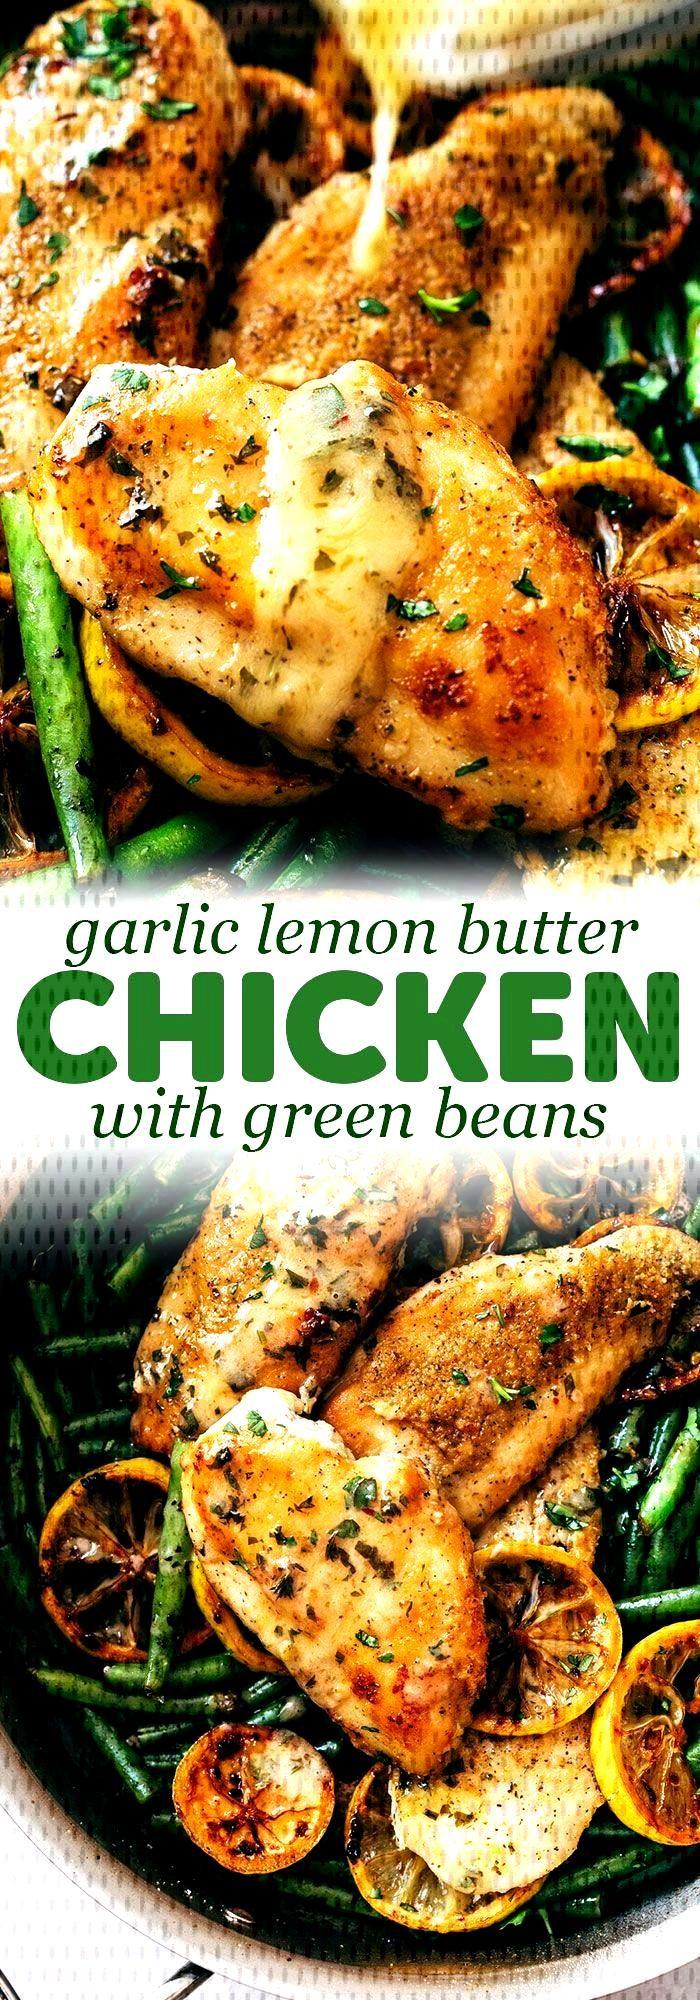 Skillet Garlic Lemon Butter Chicken Recipe | Little Spice Jar#butter